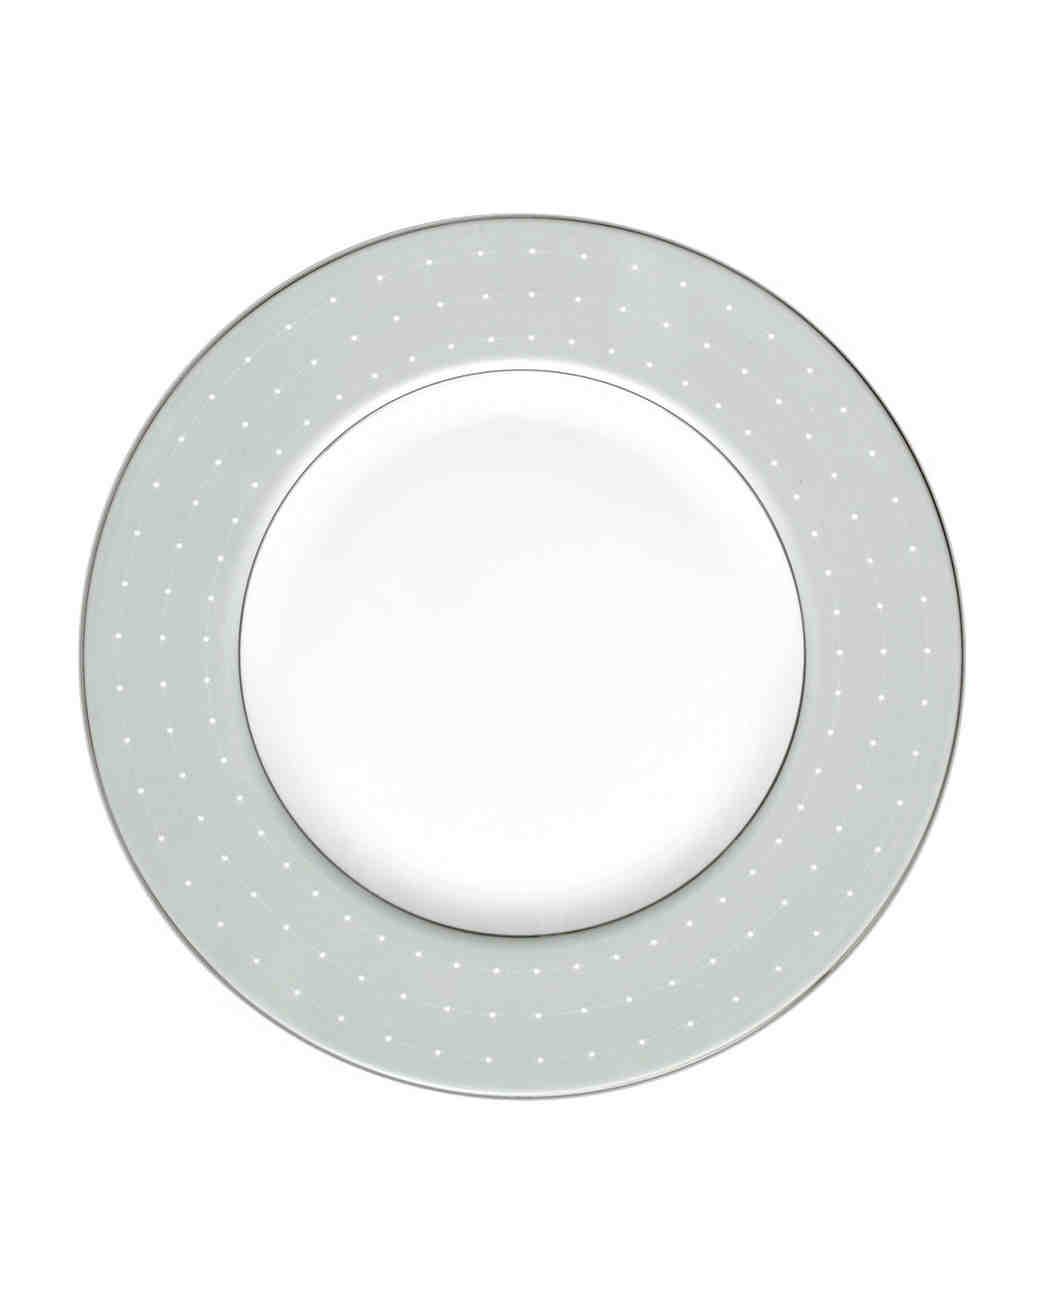 china-registry-preppy-monique-lhullier-etoile-platinum-blue-plate-1014.jpg